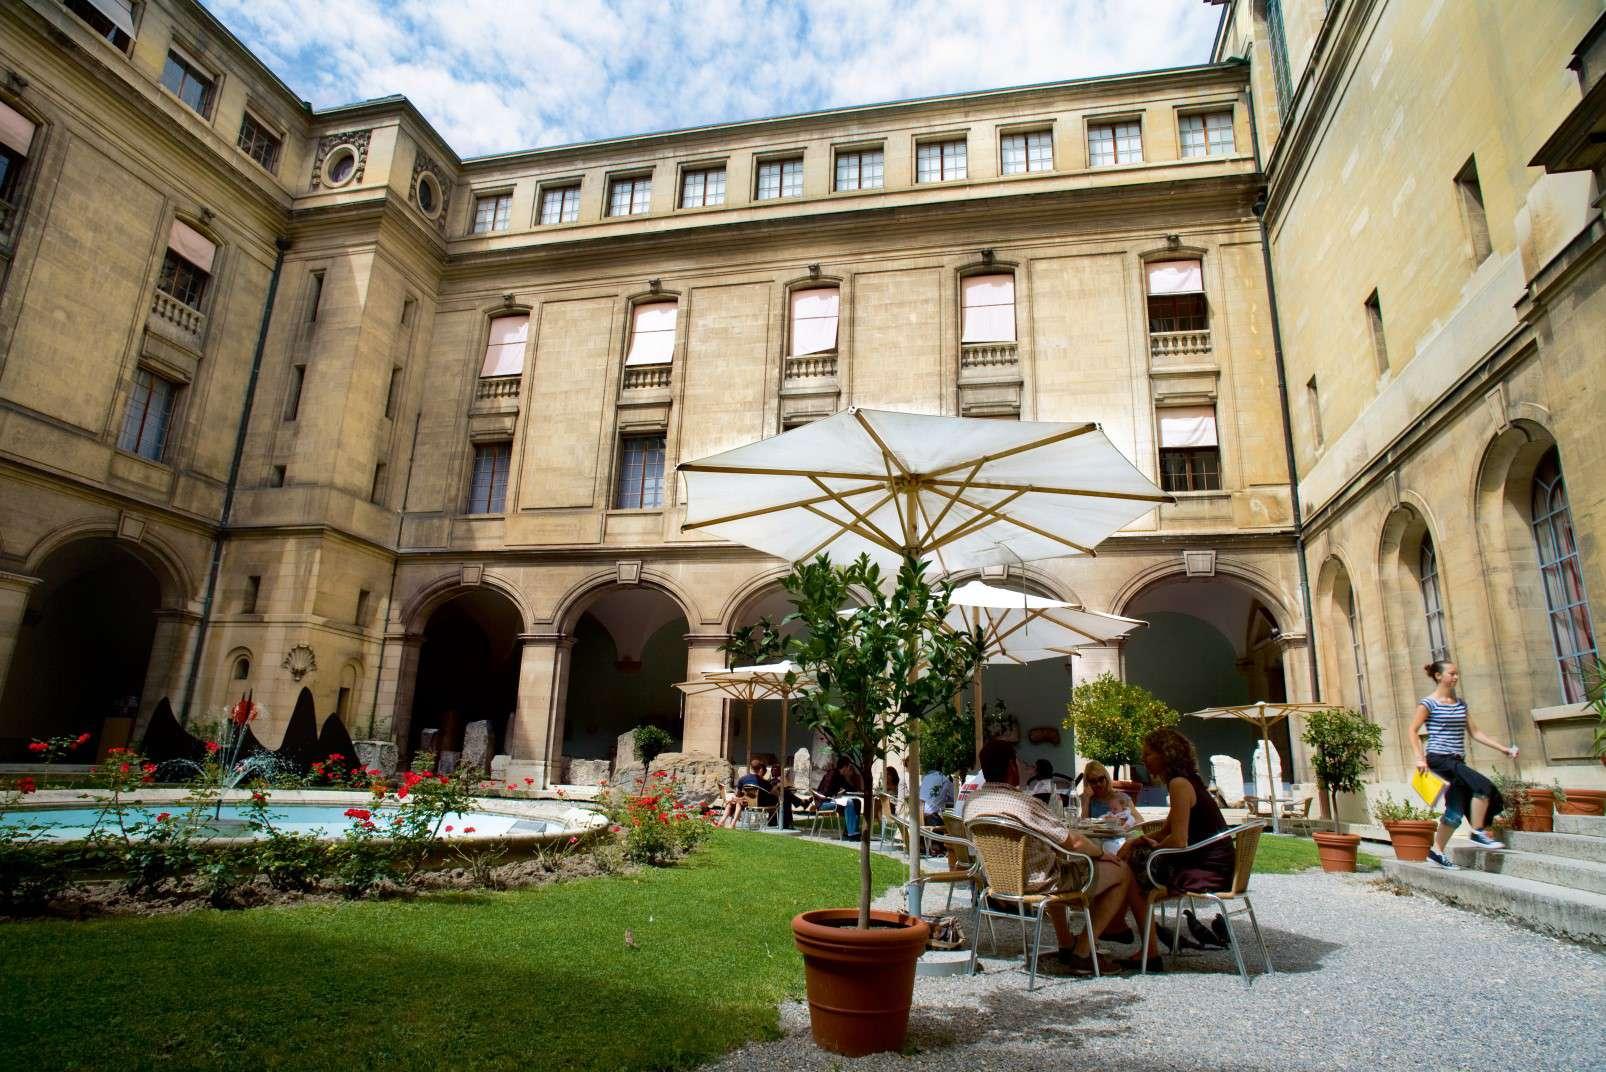 Geneva Art and History Museum